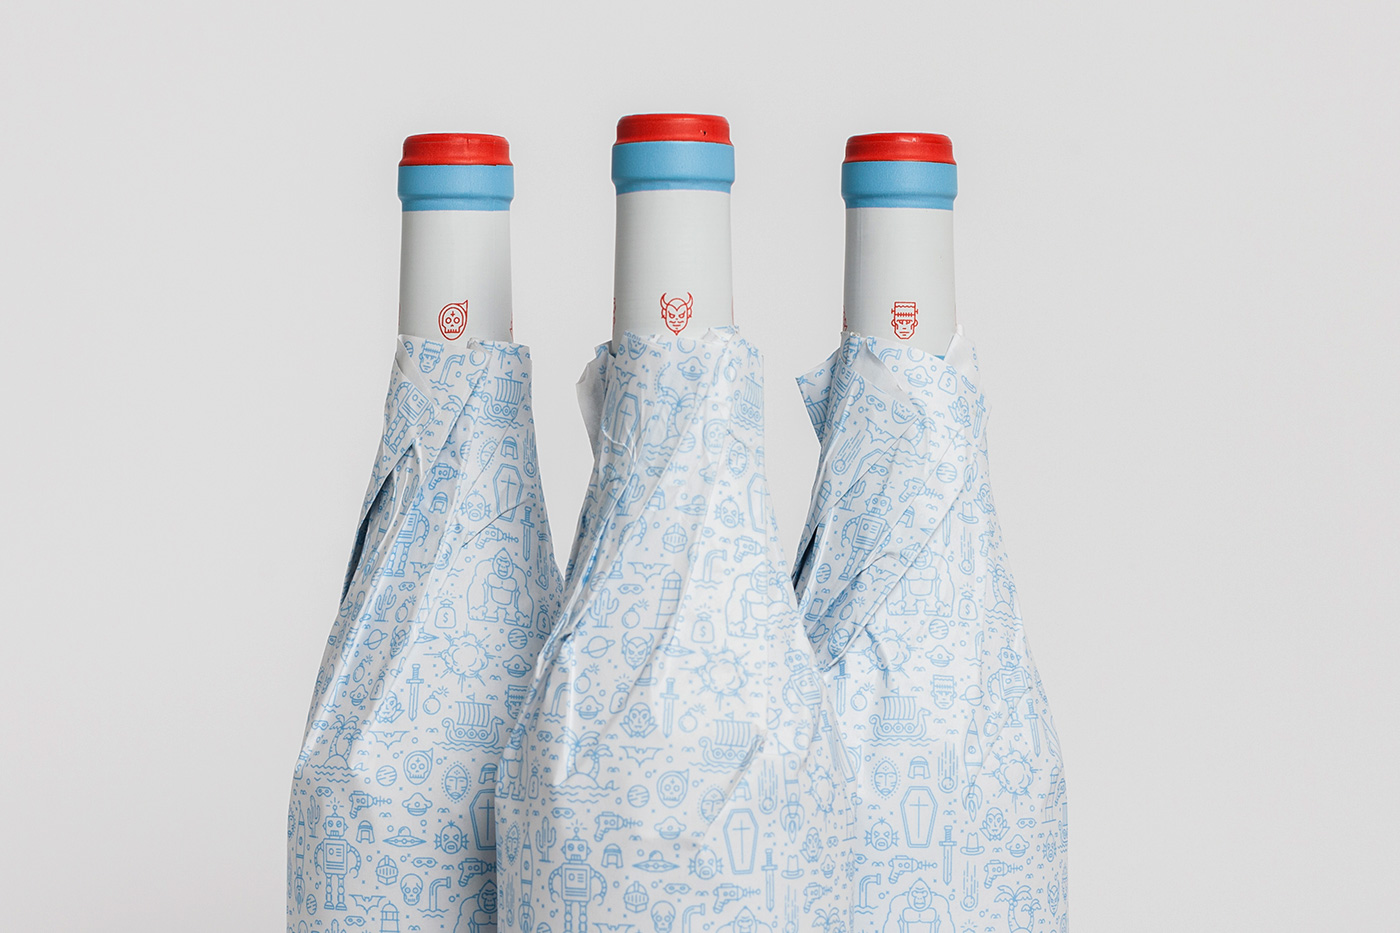 pixelarte-diseno-packaging-botella-de-vino-Ostras_pedrin-Bodega-Vicente_Gandia